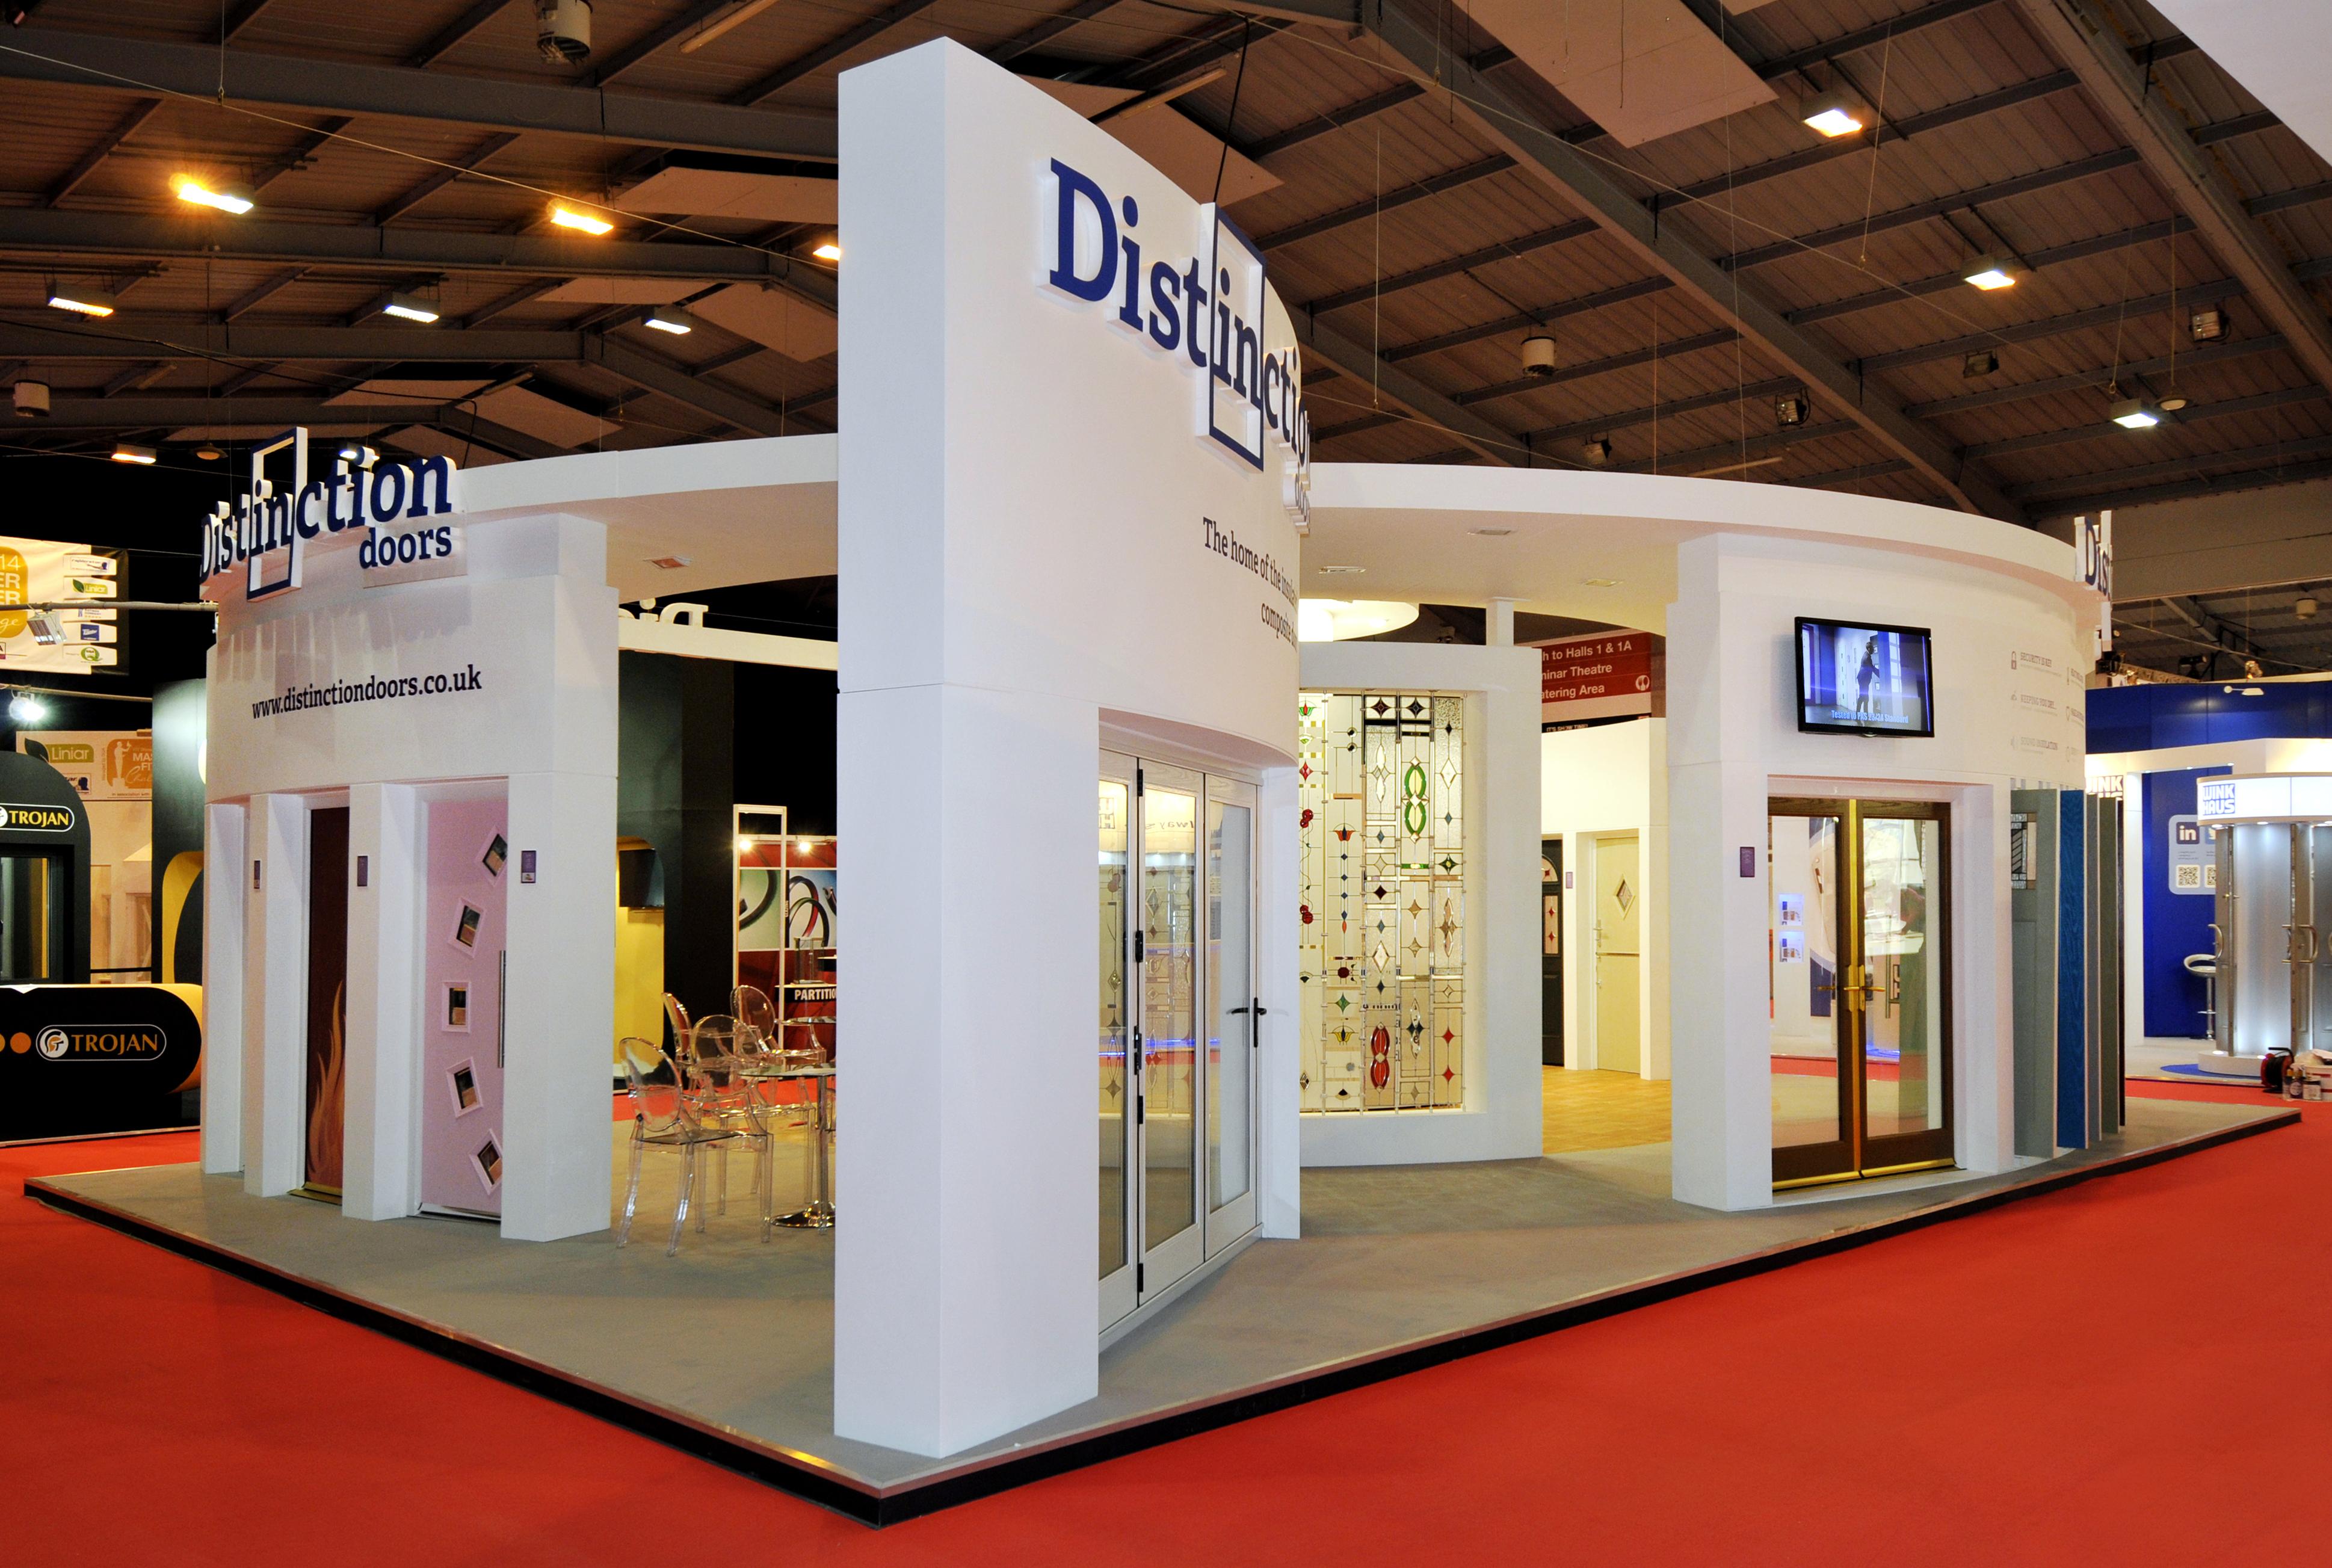 Exhibition Stand Design Yorkshire : Distinction doors quantum exhibitions and displays